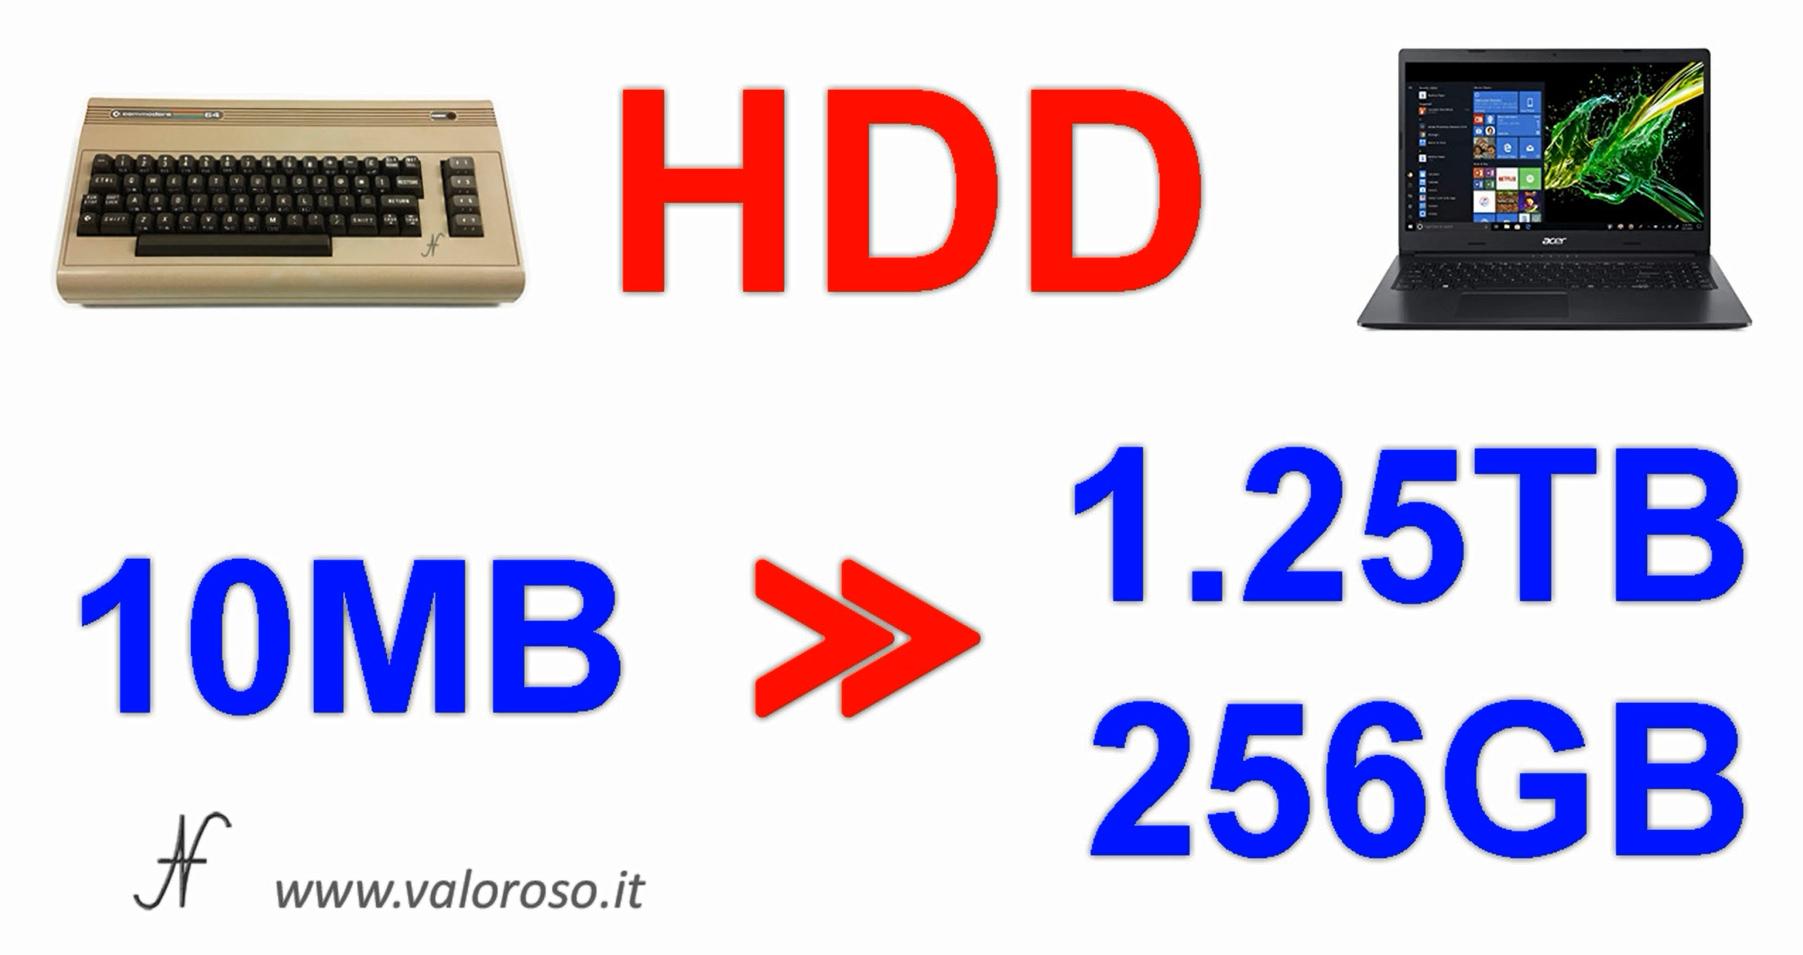 Commodore Vs PC moderno, confronto capacità HDD hard disk SSD, MByte, TByte